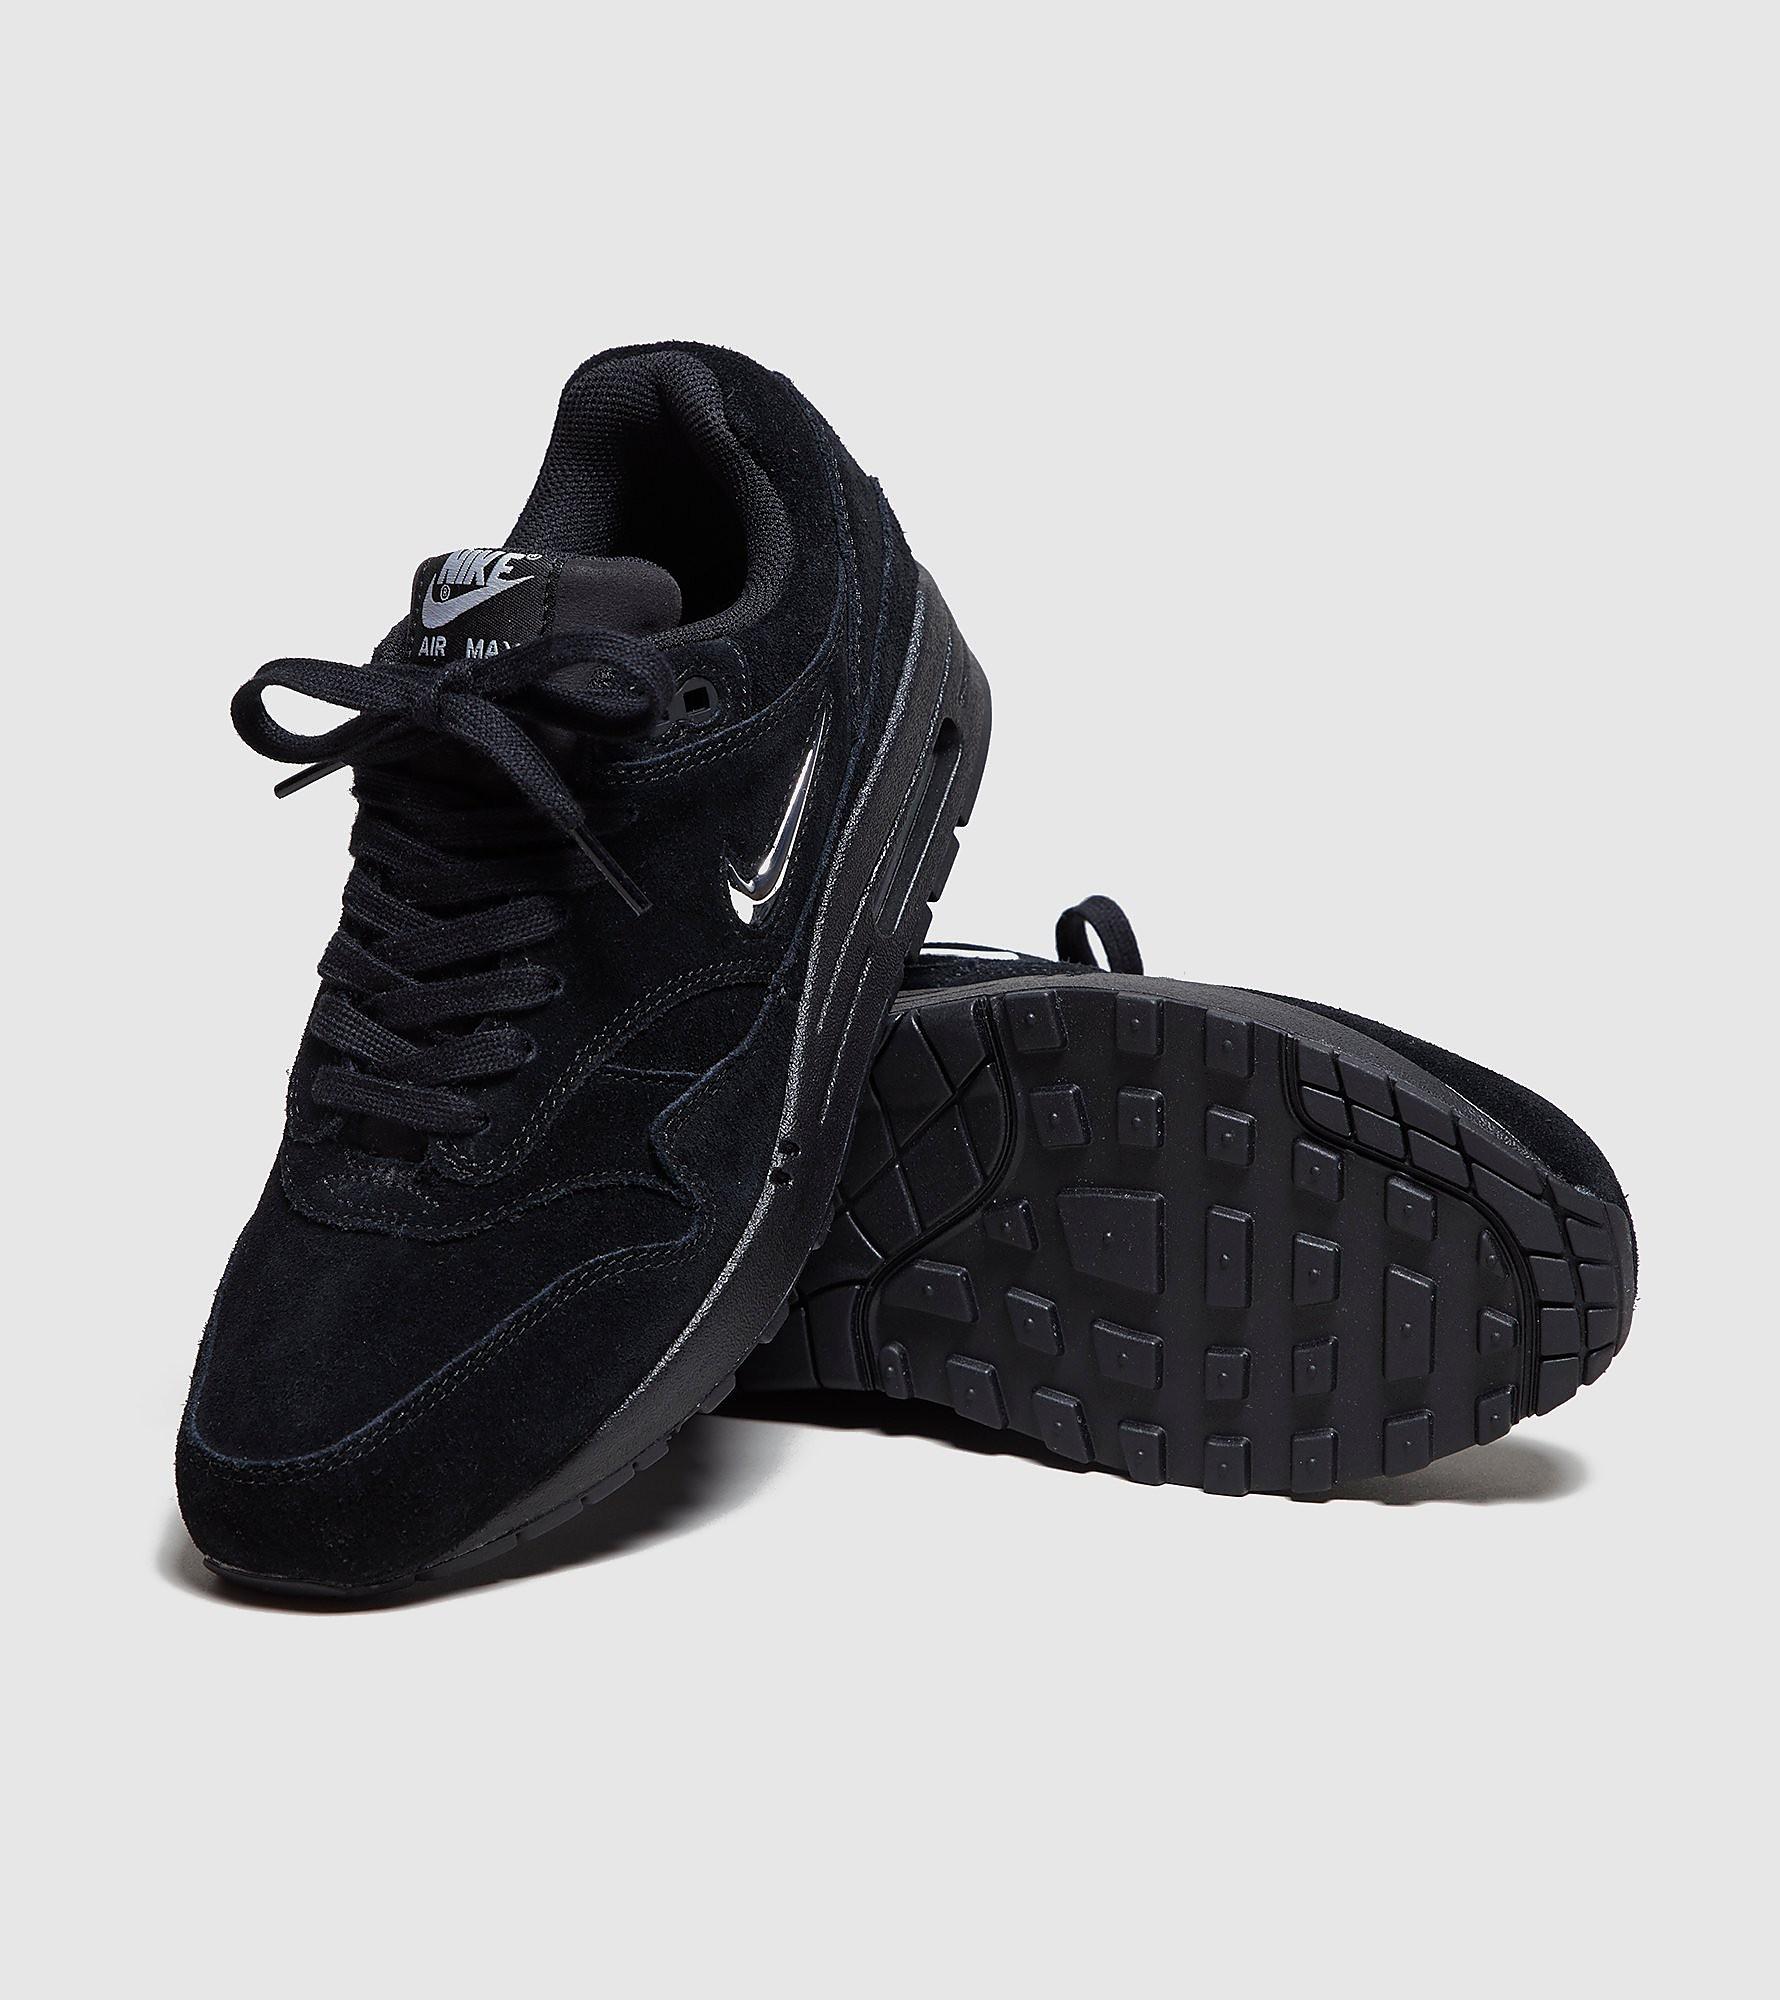 Nike Air Max 1 Jewel Women's